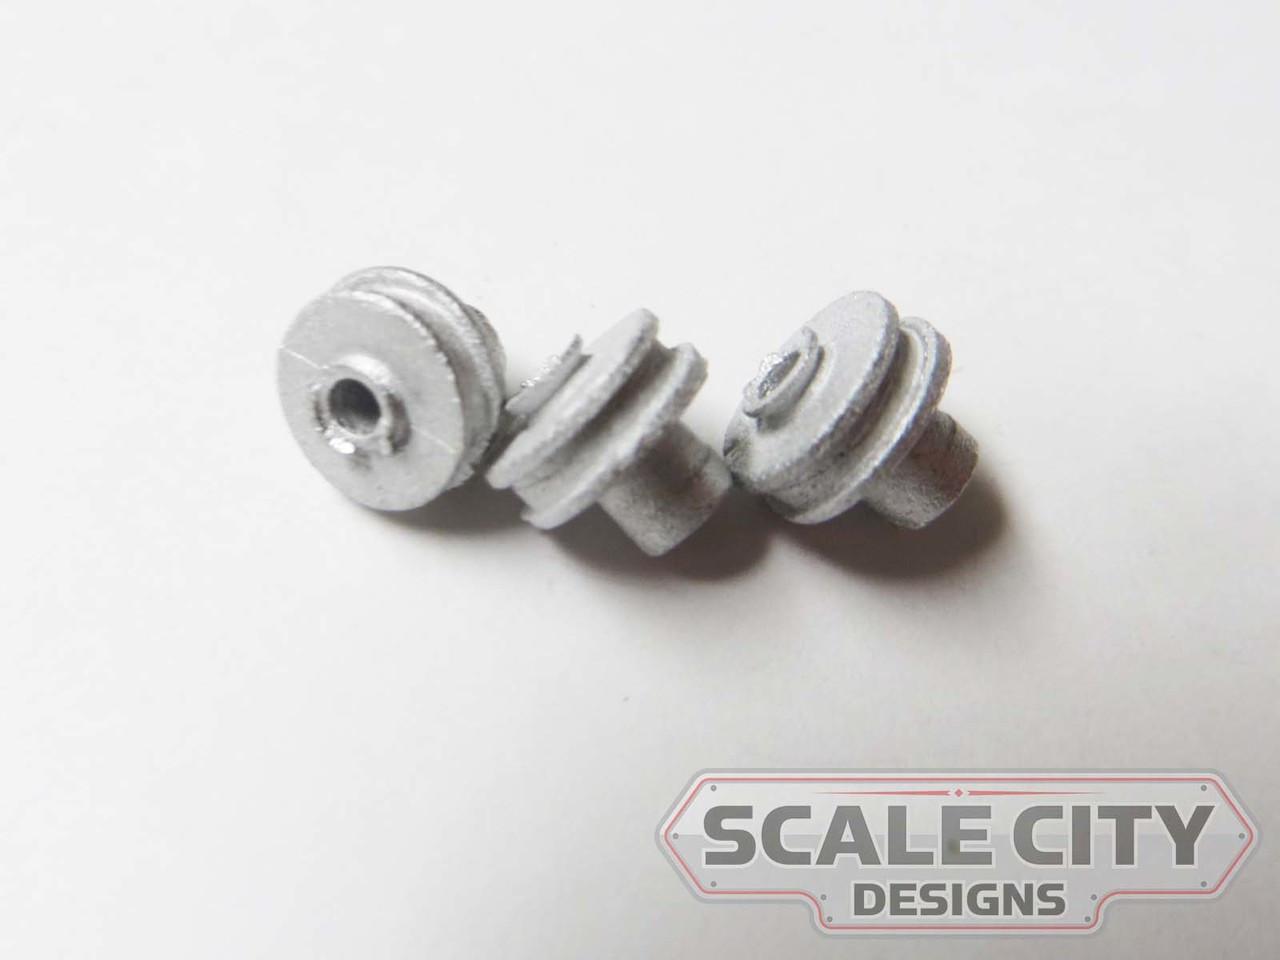 48-758 Machine Pulley Small industrial O Scale FKA KEIL LINE